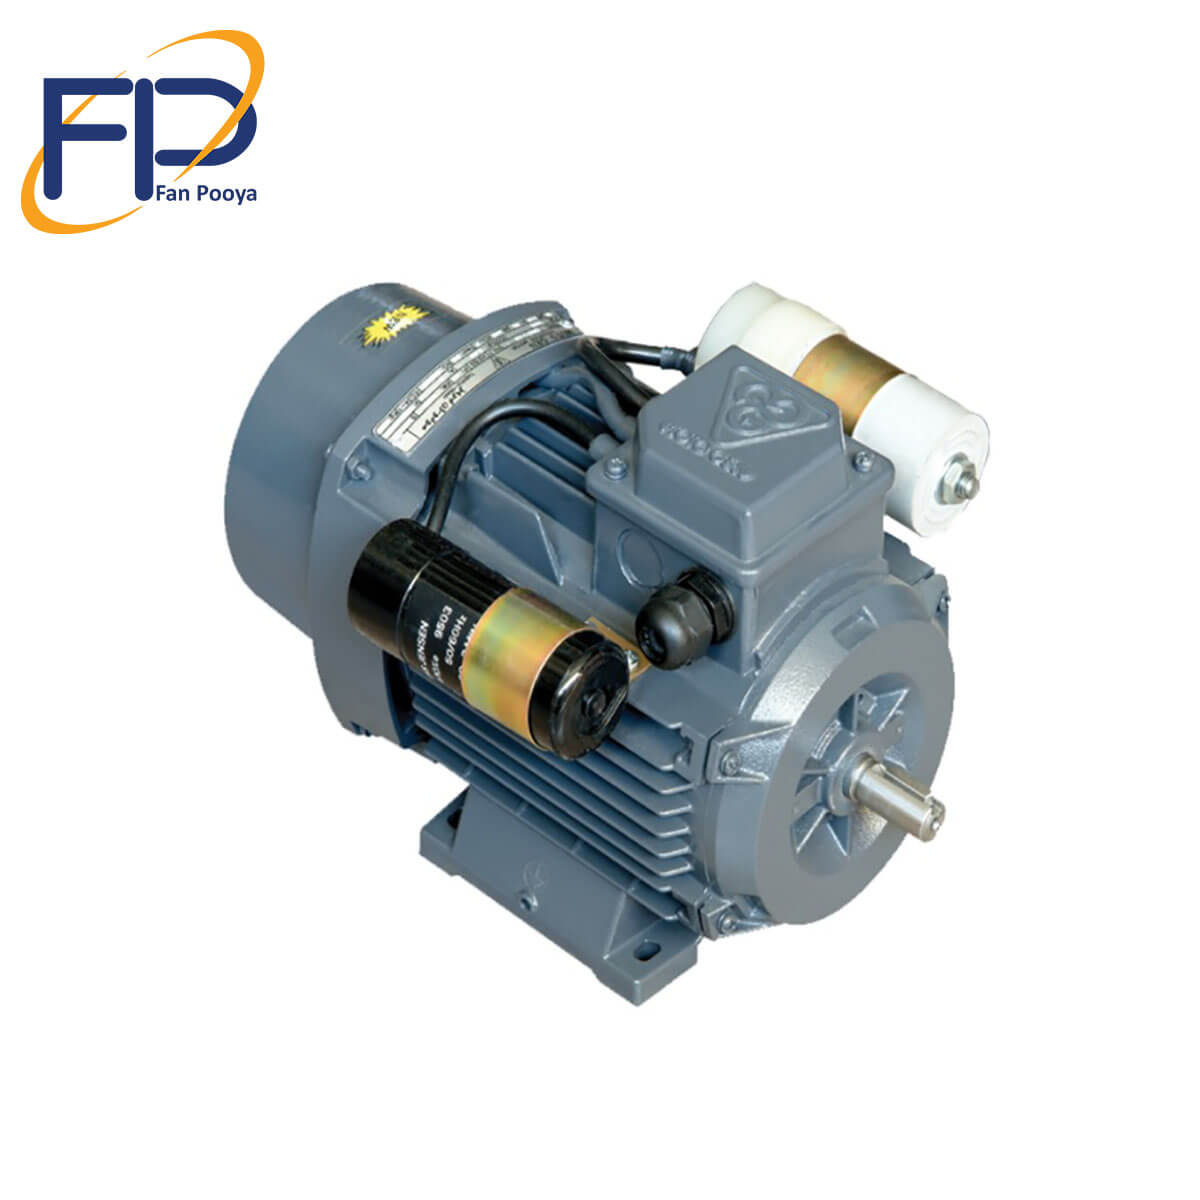 الکتروموتورموتوژن تک فازخازن استارت(CRS)تک دورقدرت1.1kwکیلو وات 3000دور